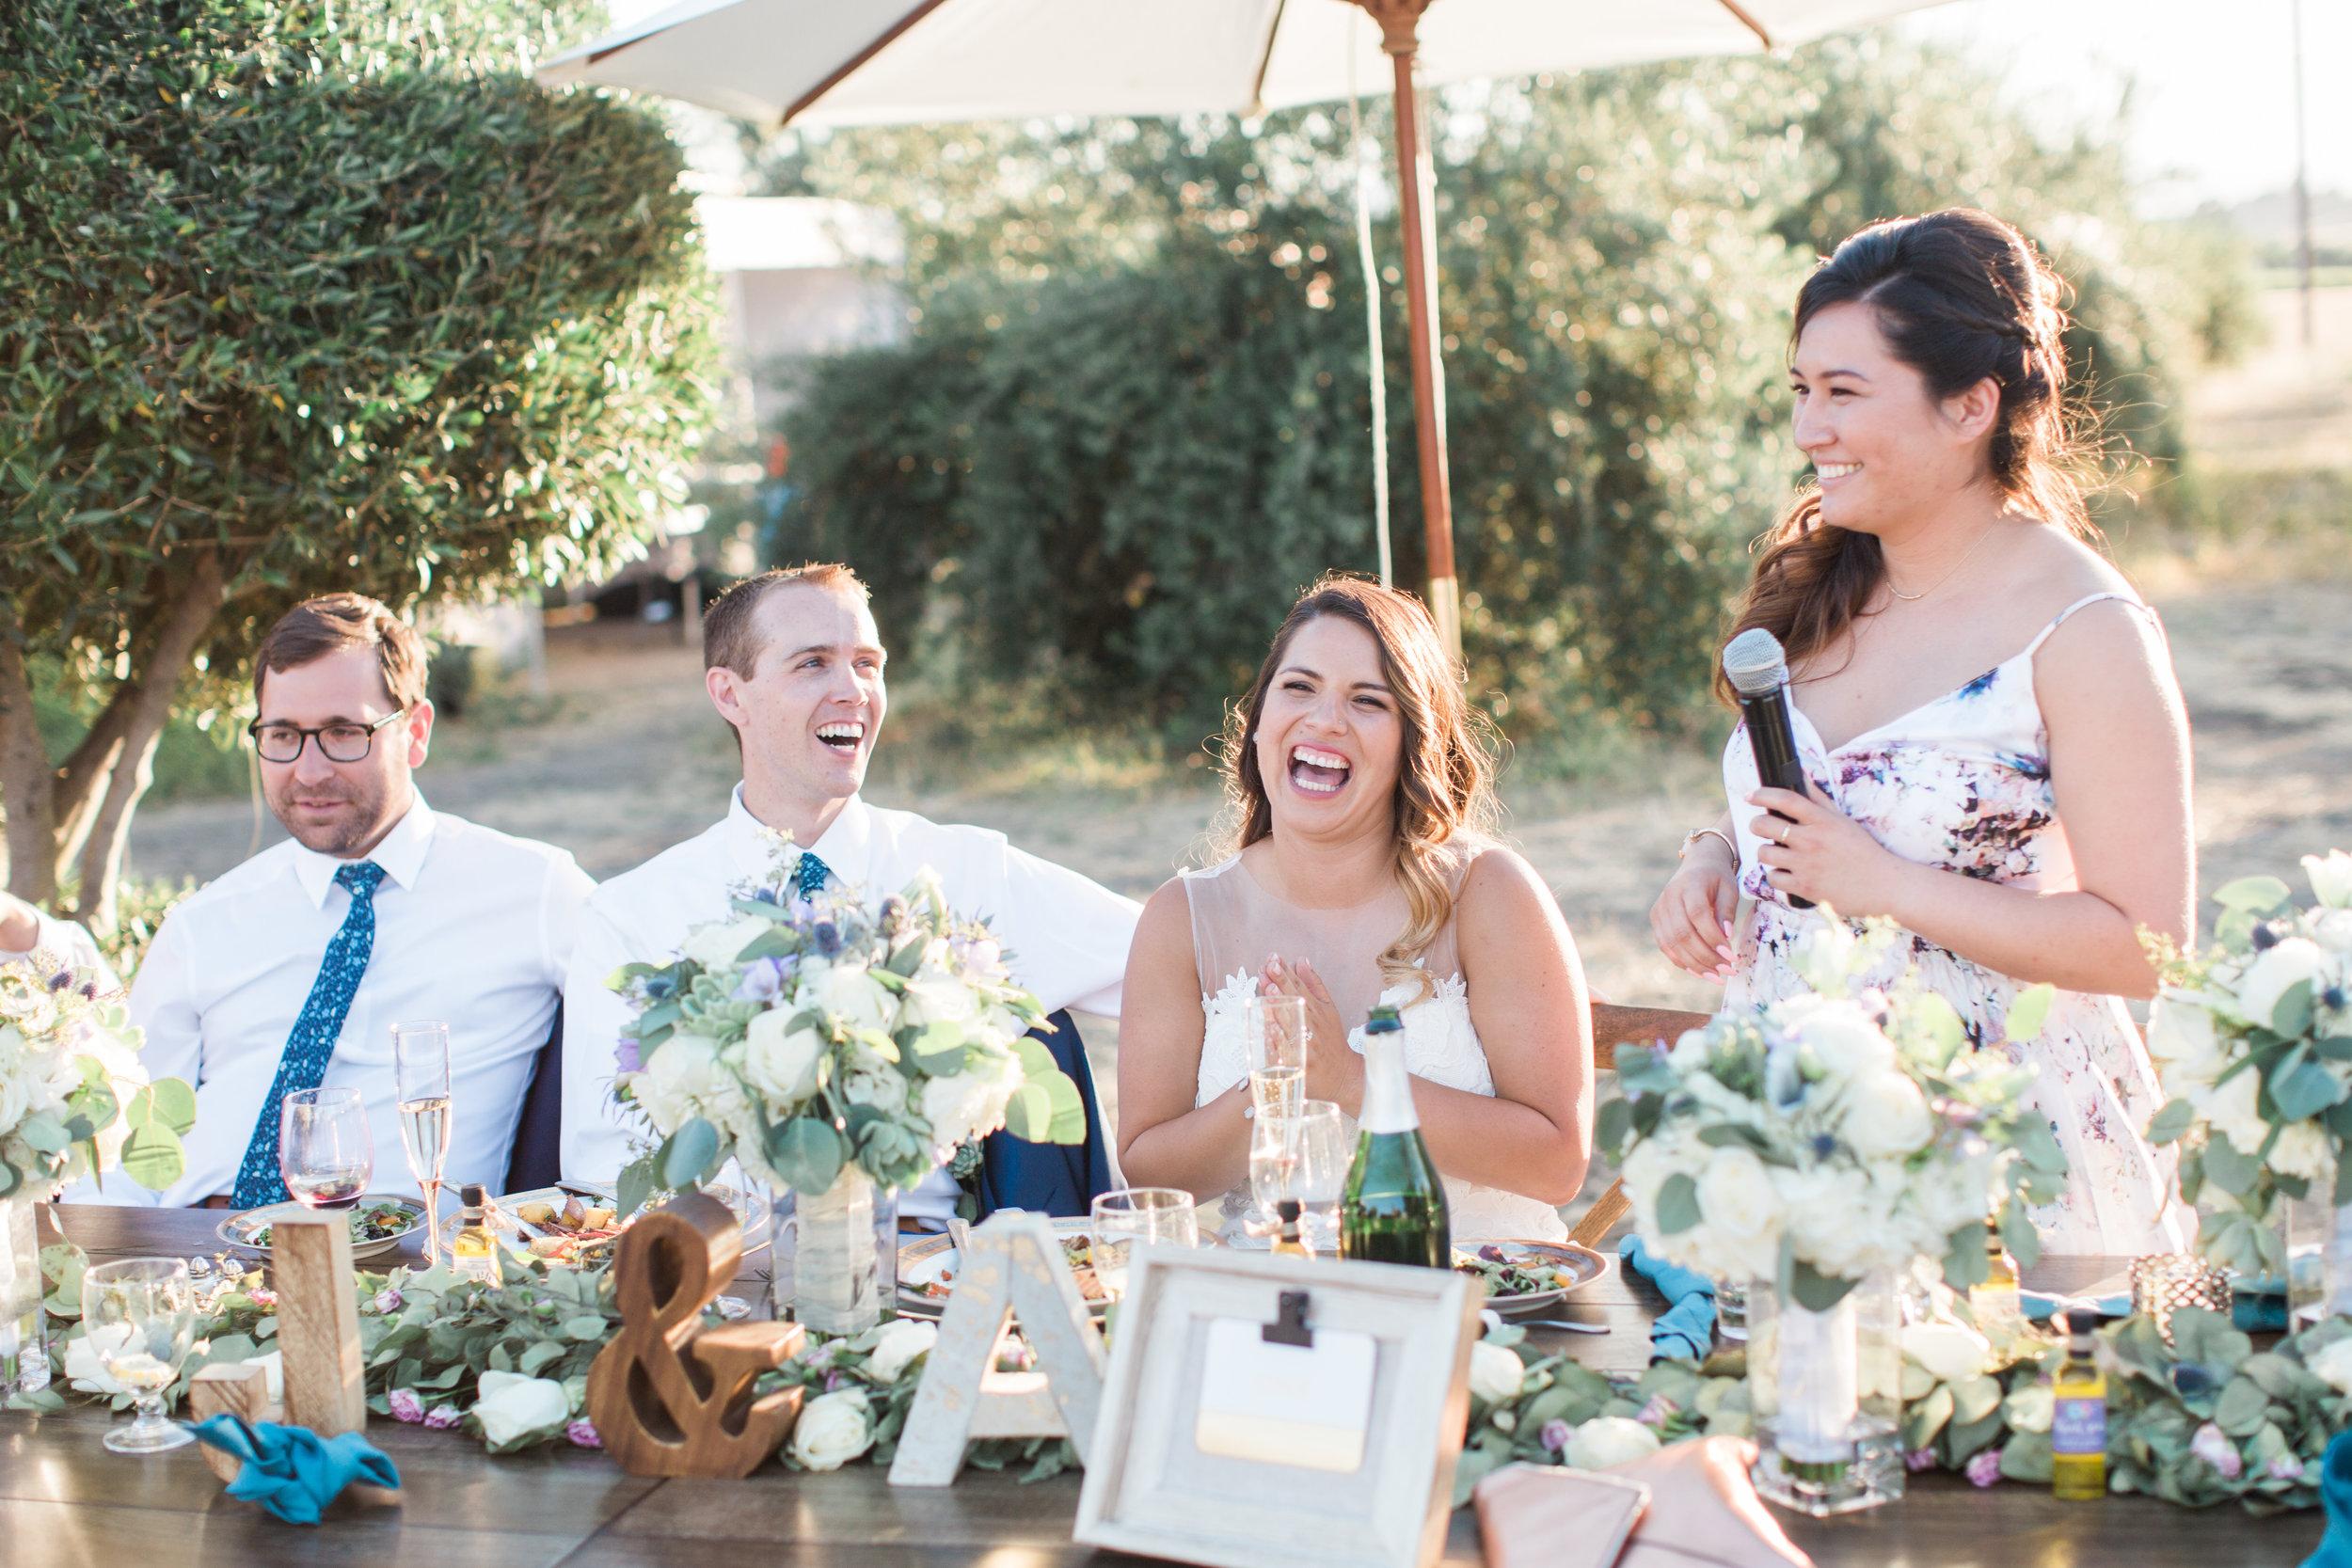 the-purple-orchid-resort-wedding-in-livermore-california-16.jpg